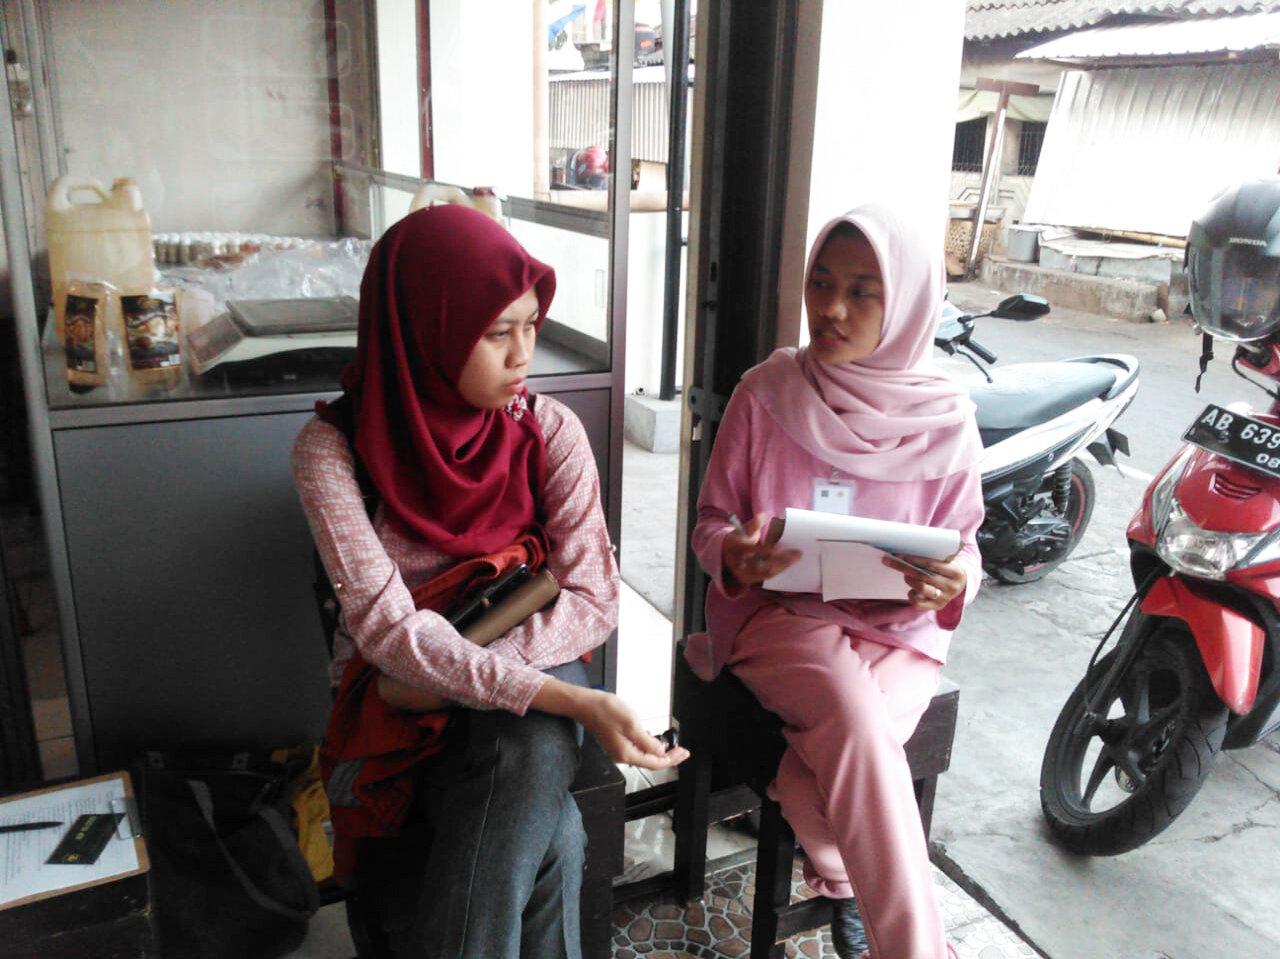 Enumerators have been working with Tian to complete consumer interviews in Jogyakarta.  Photo: Tian Jihadhan Wankar